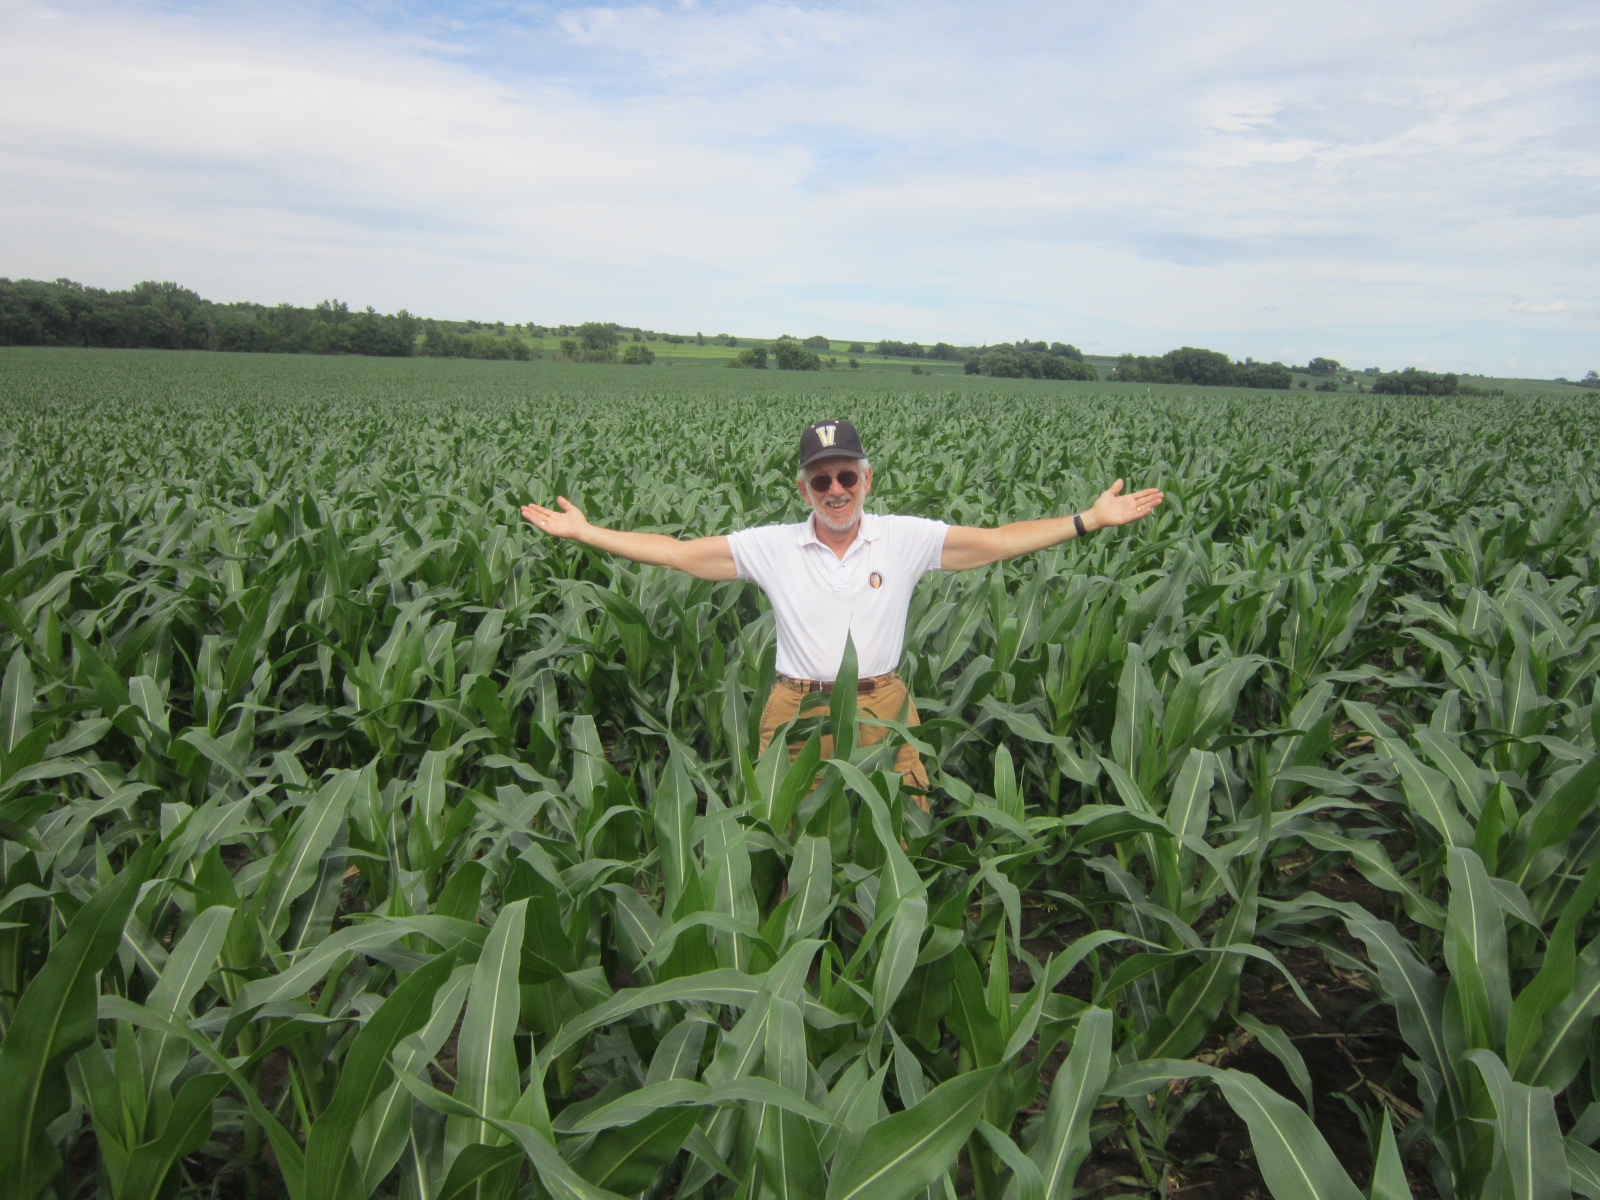 Paul Kurtz in Iowa cornfield June 24 B.JPG